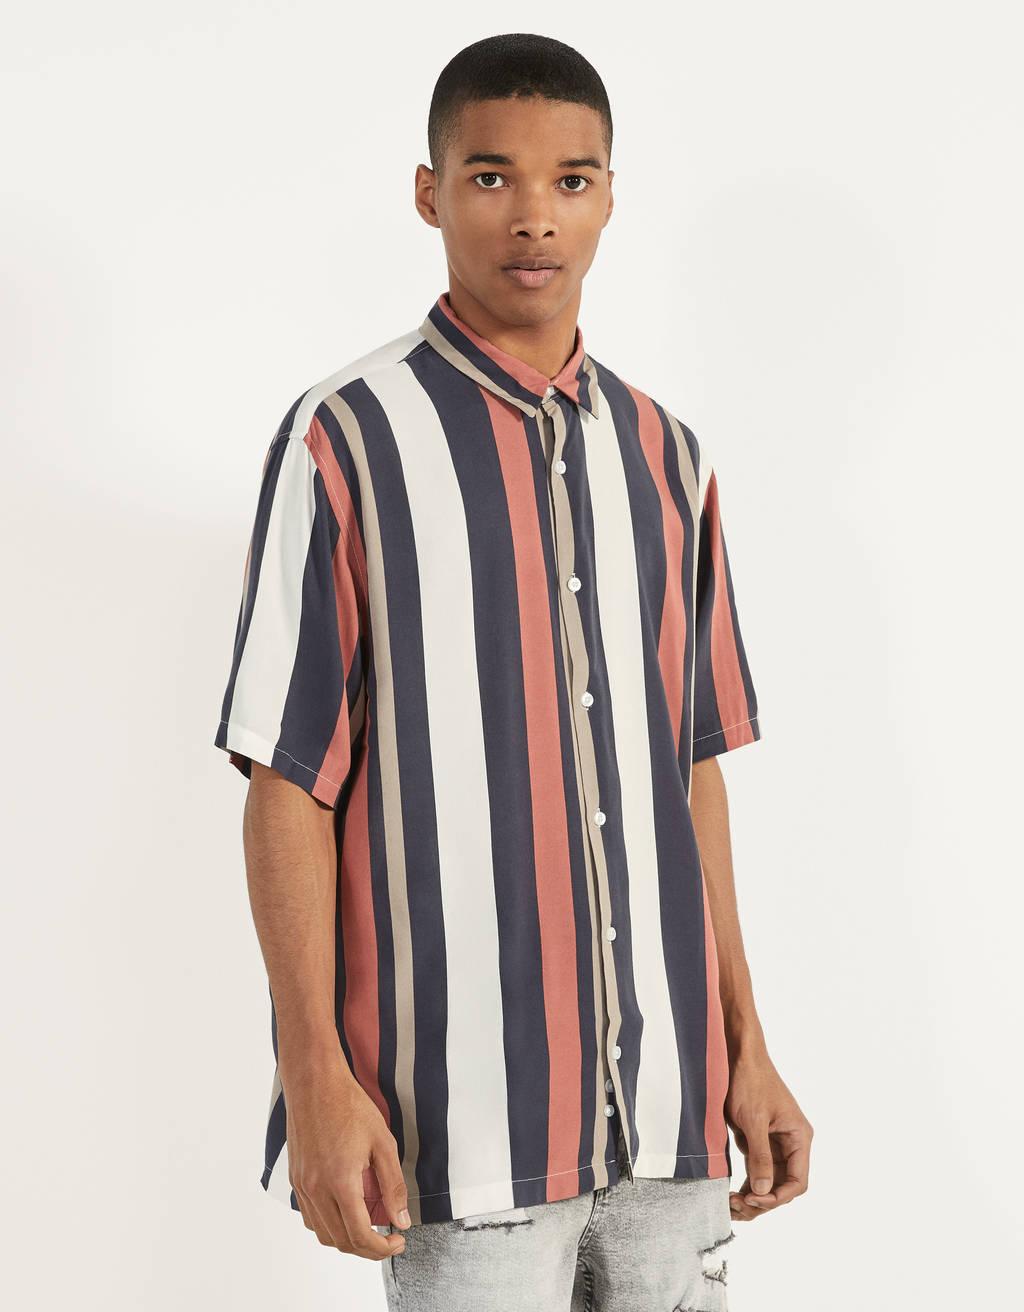 Printed shirt